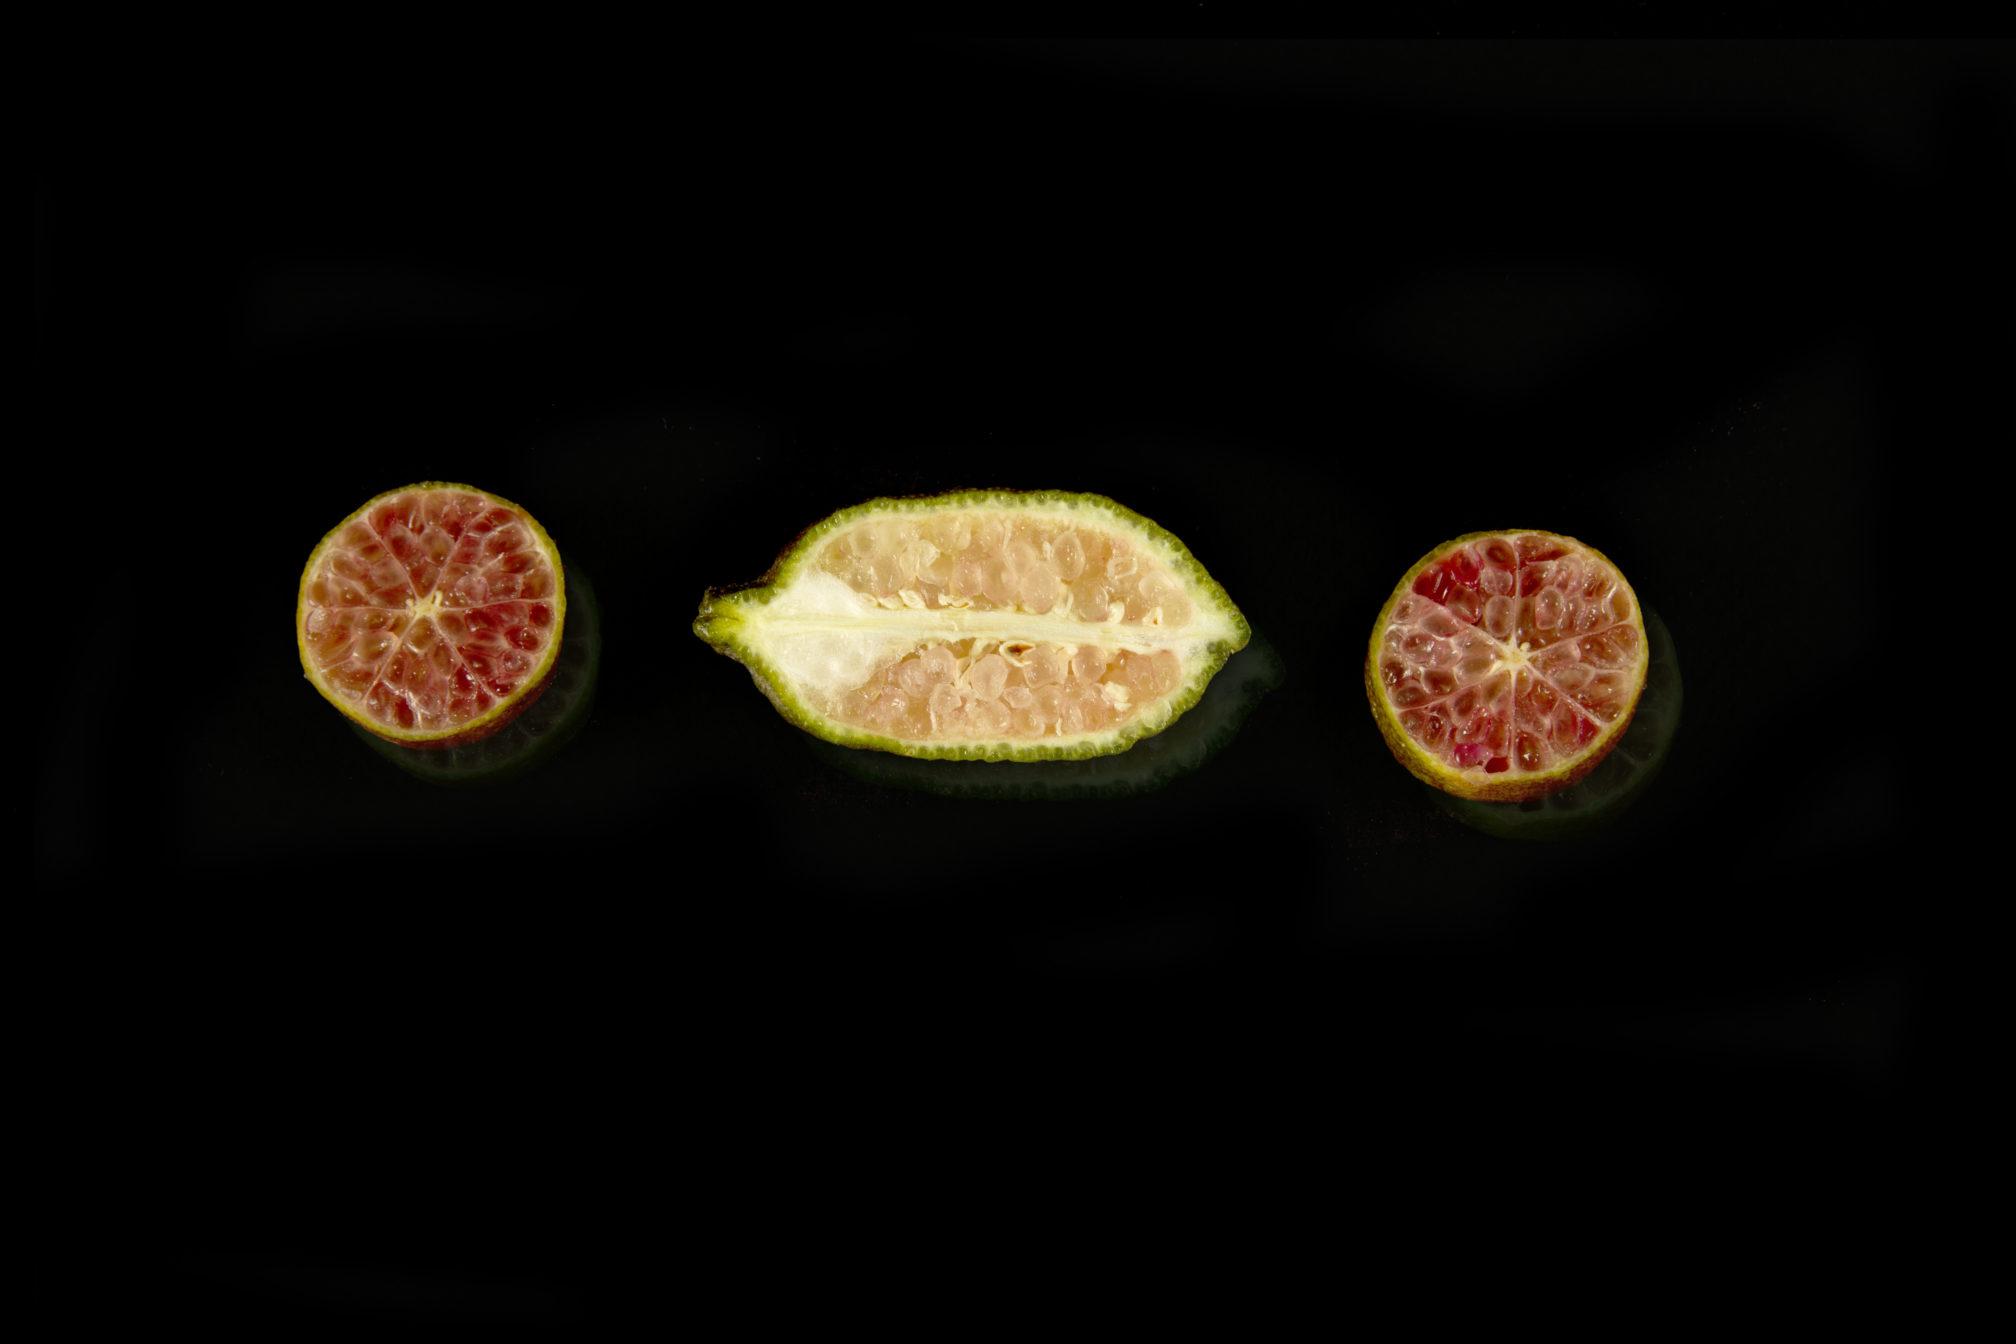 Lilot-fruits-capexo-citron-caviar-australie-Israel-France-USA-Etats-Unis-Pearl-Citrus